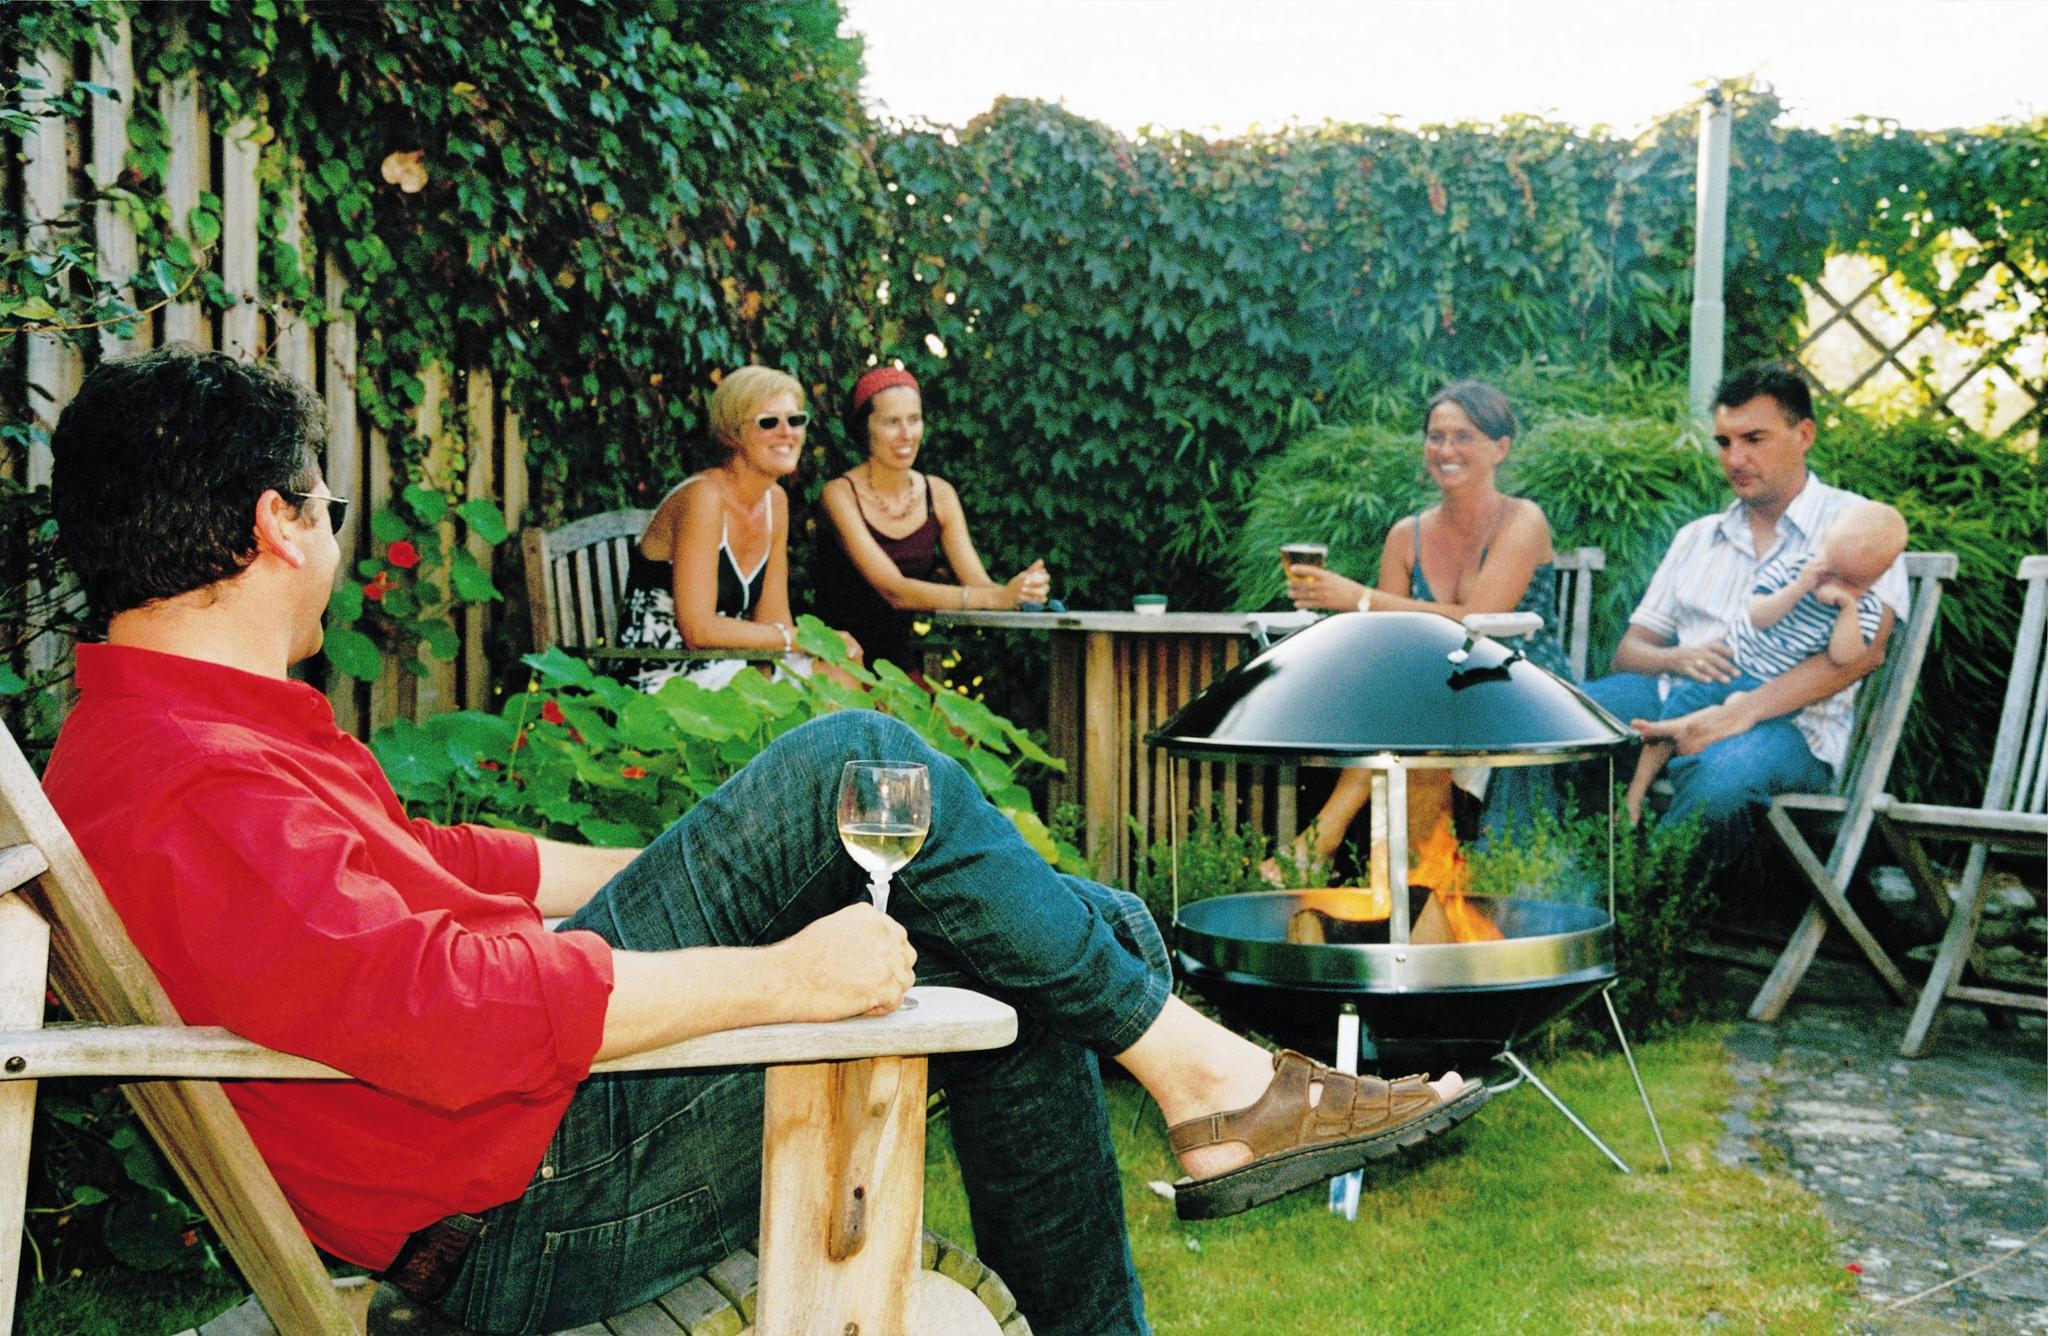 Terrasse chauff e svp lorraine magazine for Cheminee exterieur weber